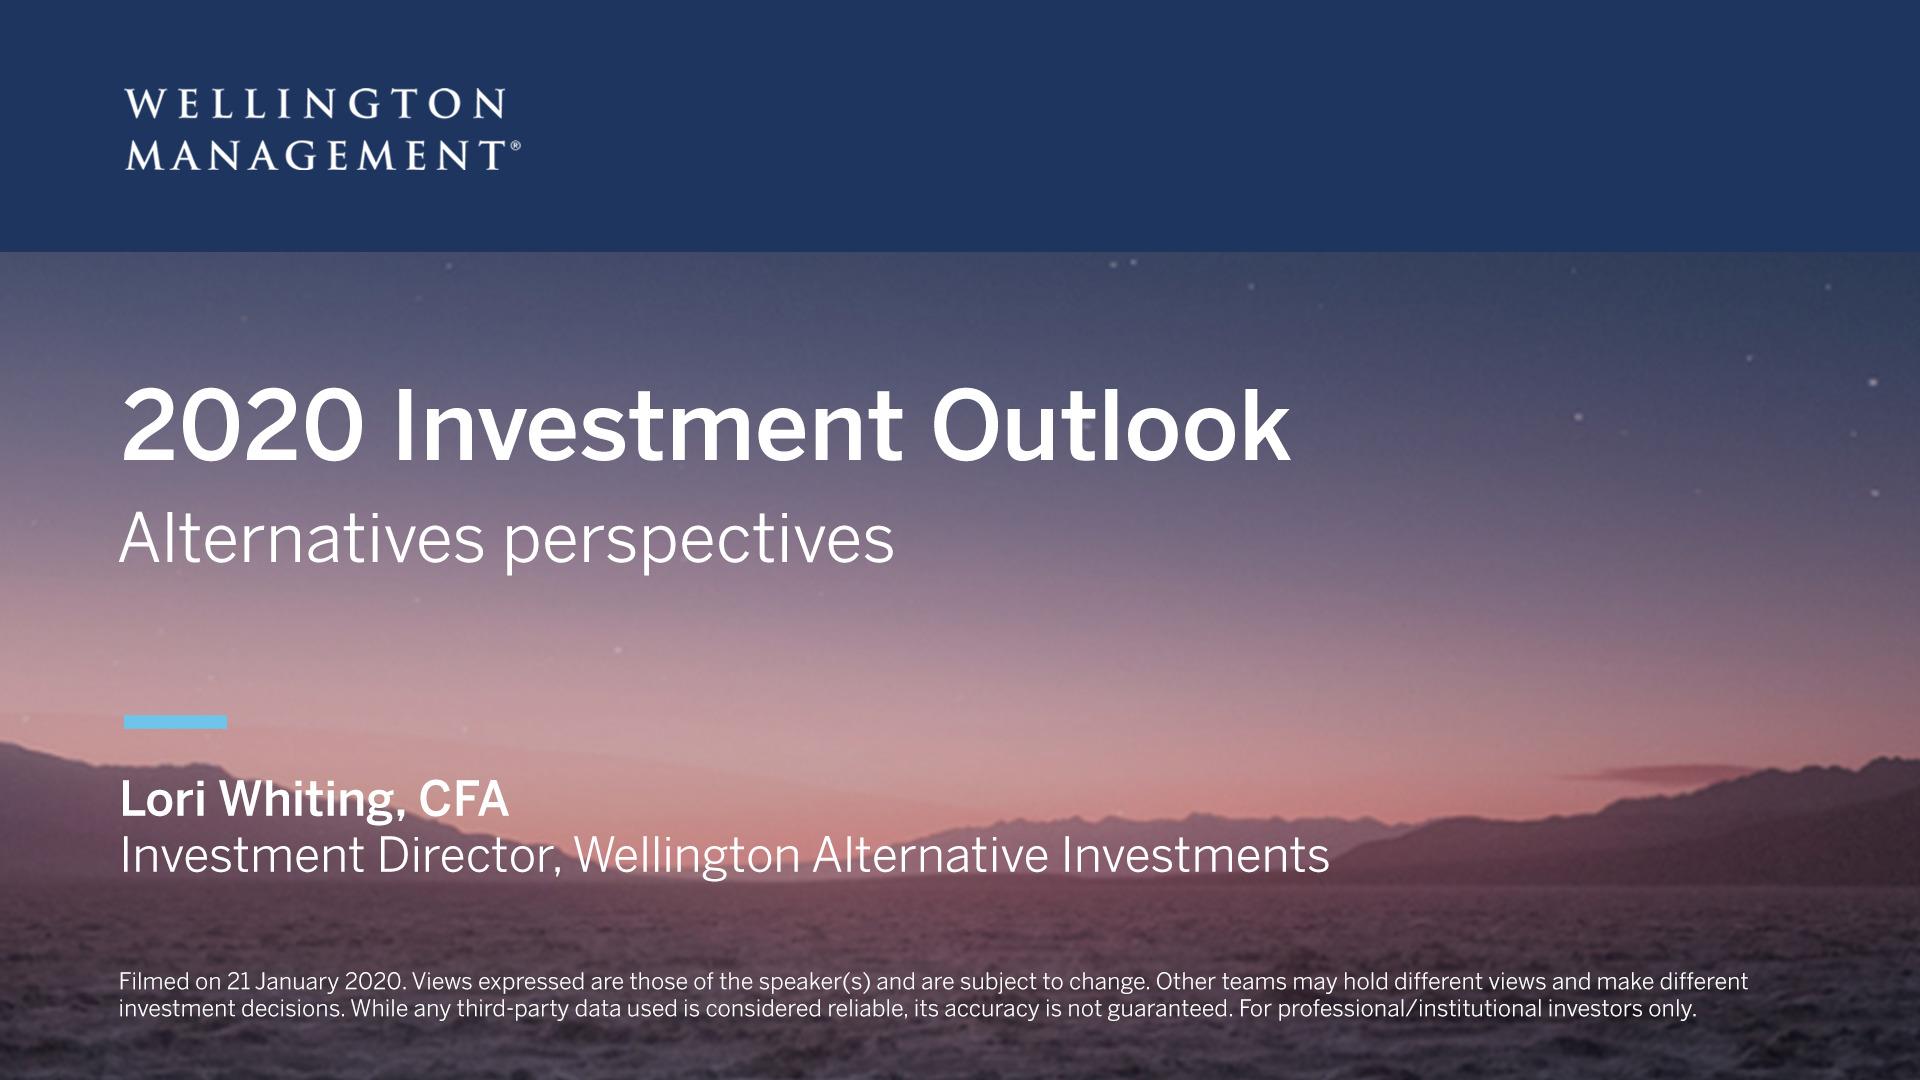 2020 Alternatives Outlook Us Wellington Management